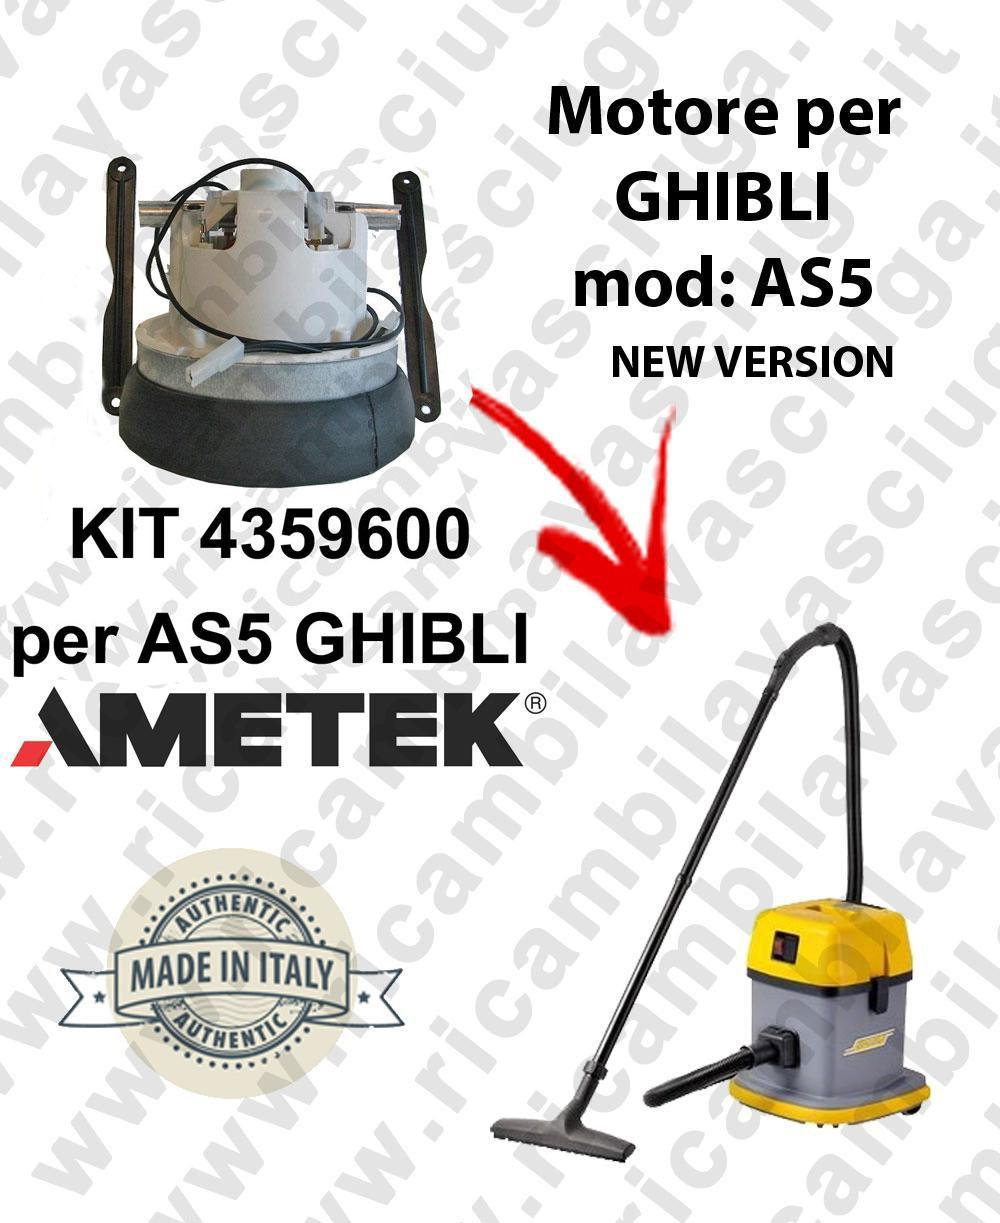 4359600 KIT Motore de aspiración AMETEK para aspiradora para GHIBLI AS5